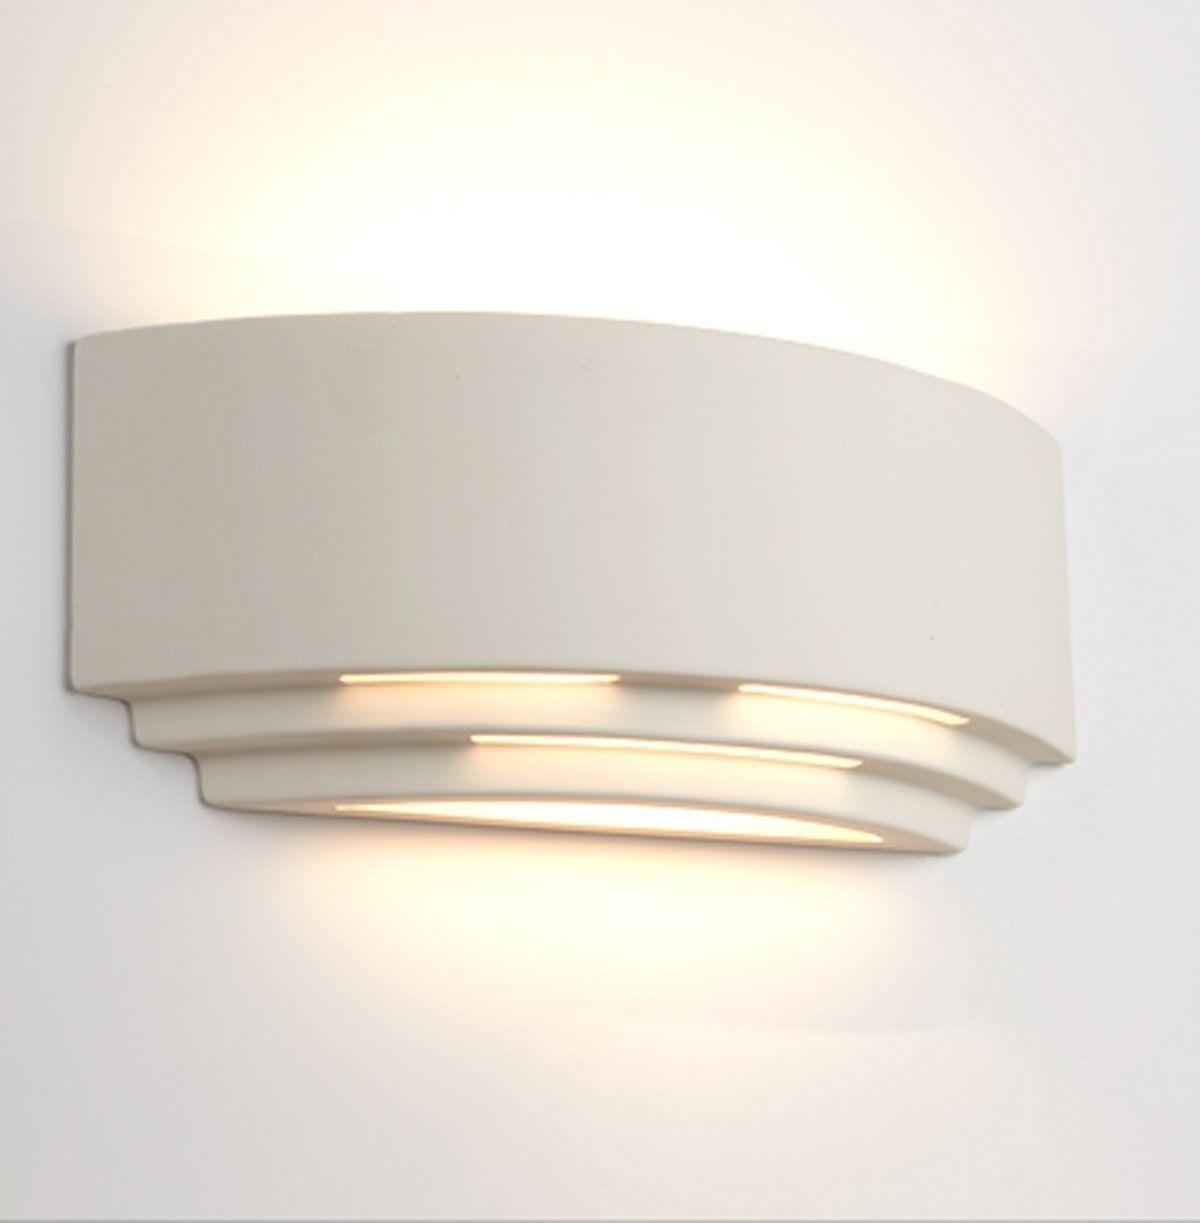 Searchlight Ceramic Wall Light Fixture - 25 Watt Natural Plaster